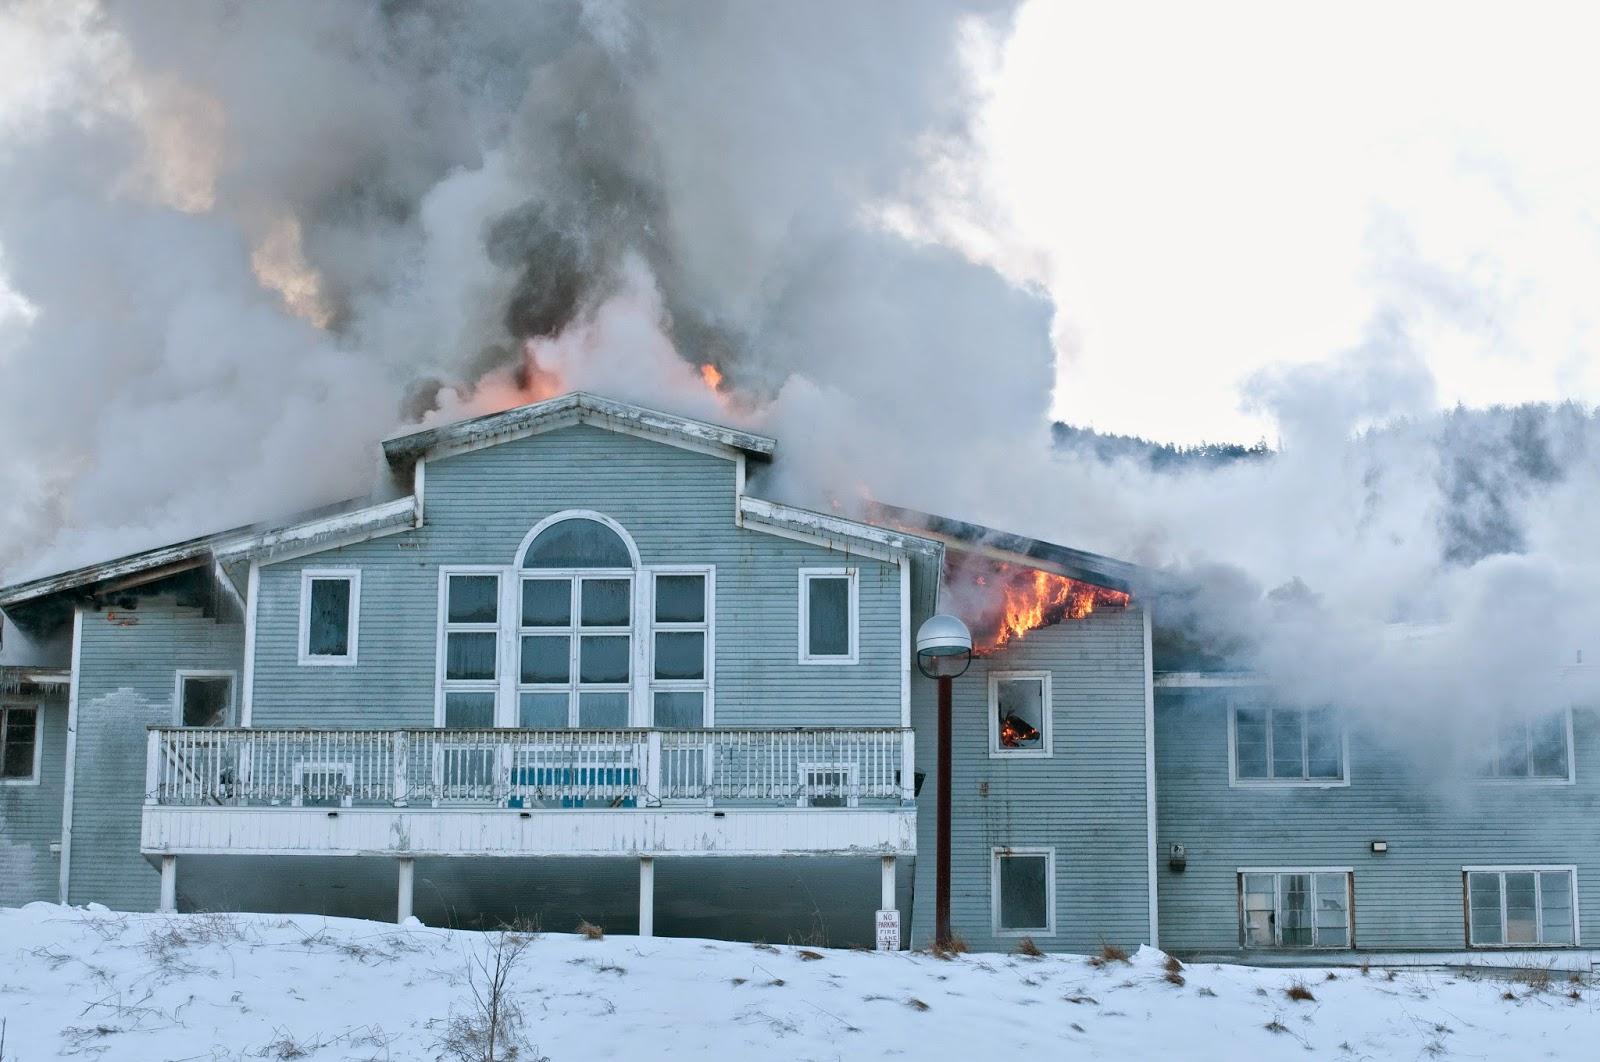 fire at former ascutney mountain resort base lodge #vt #westwindsorvt